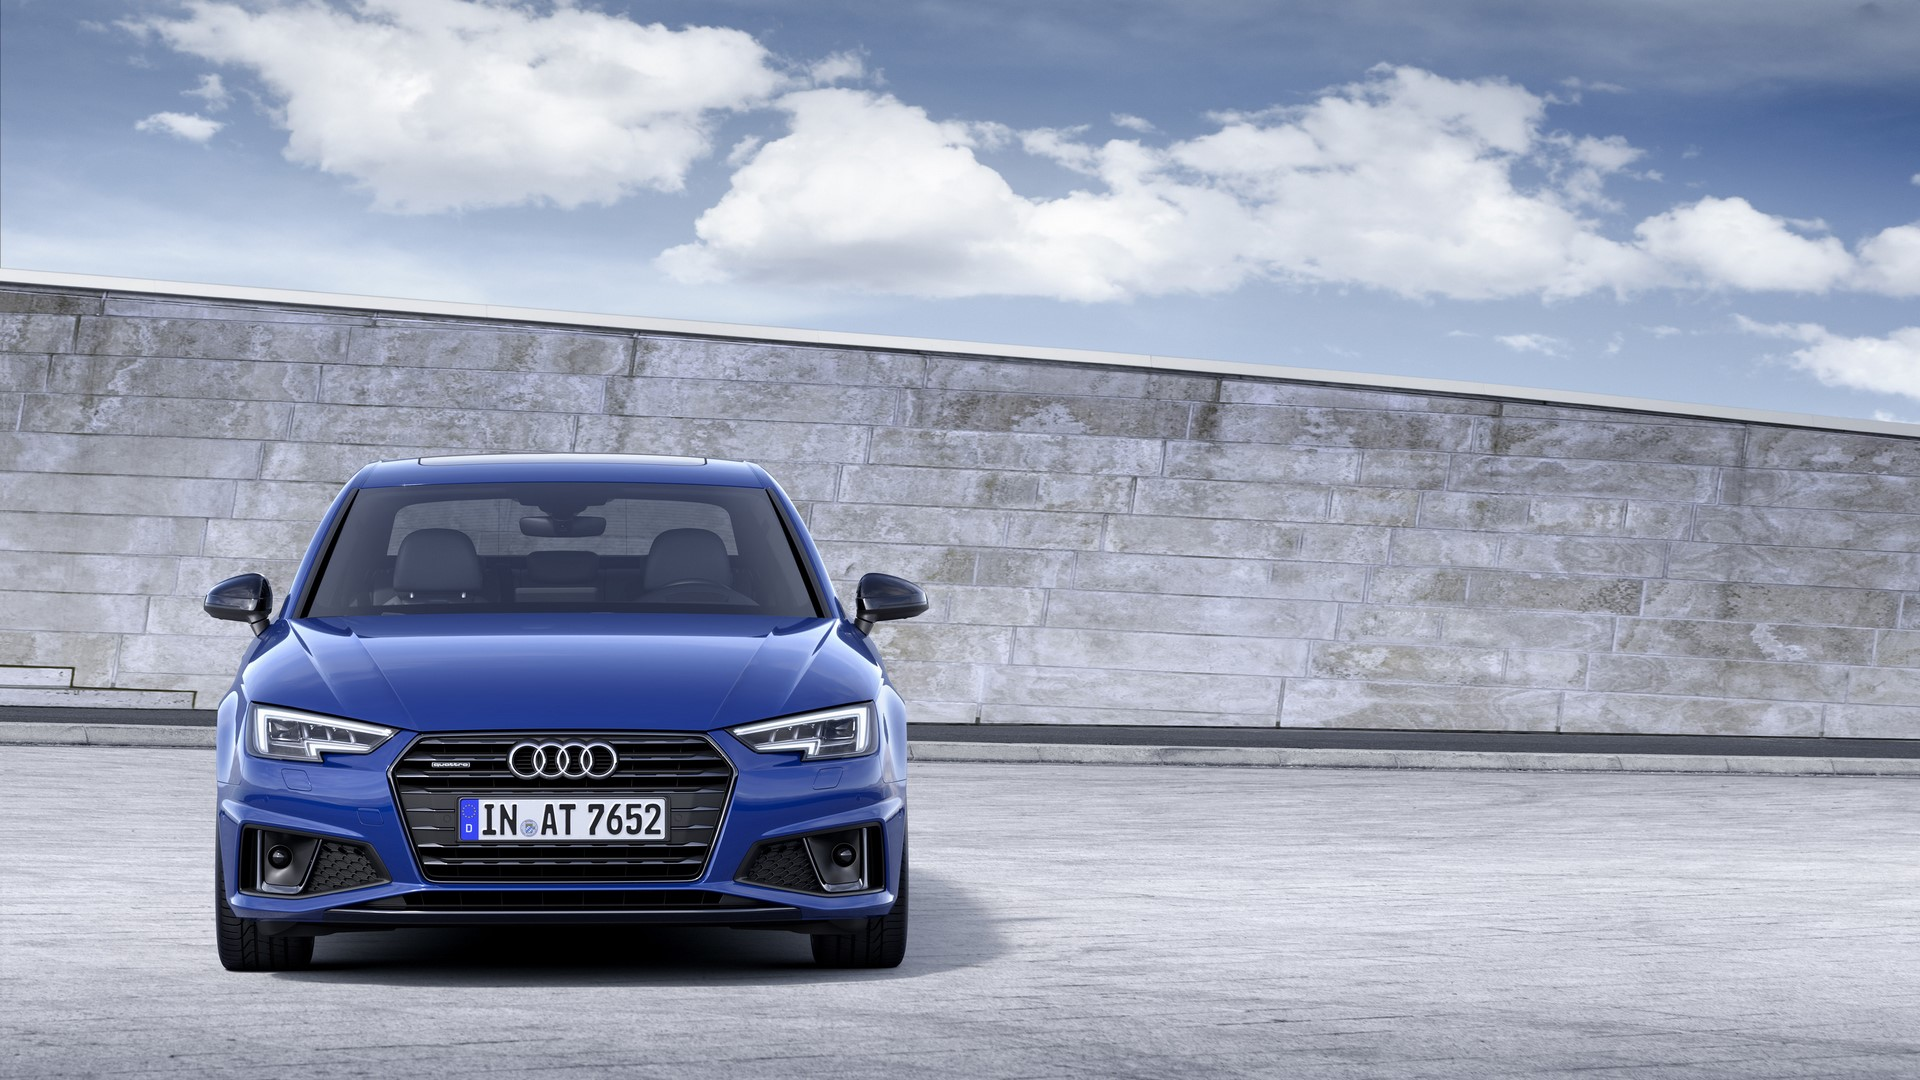 Audi A4 Facelift 2019 (1)